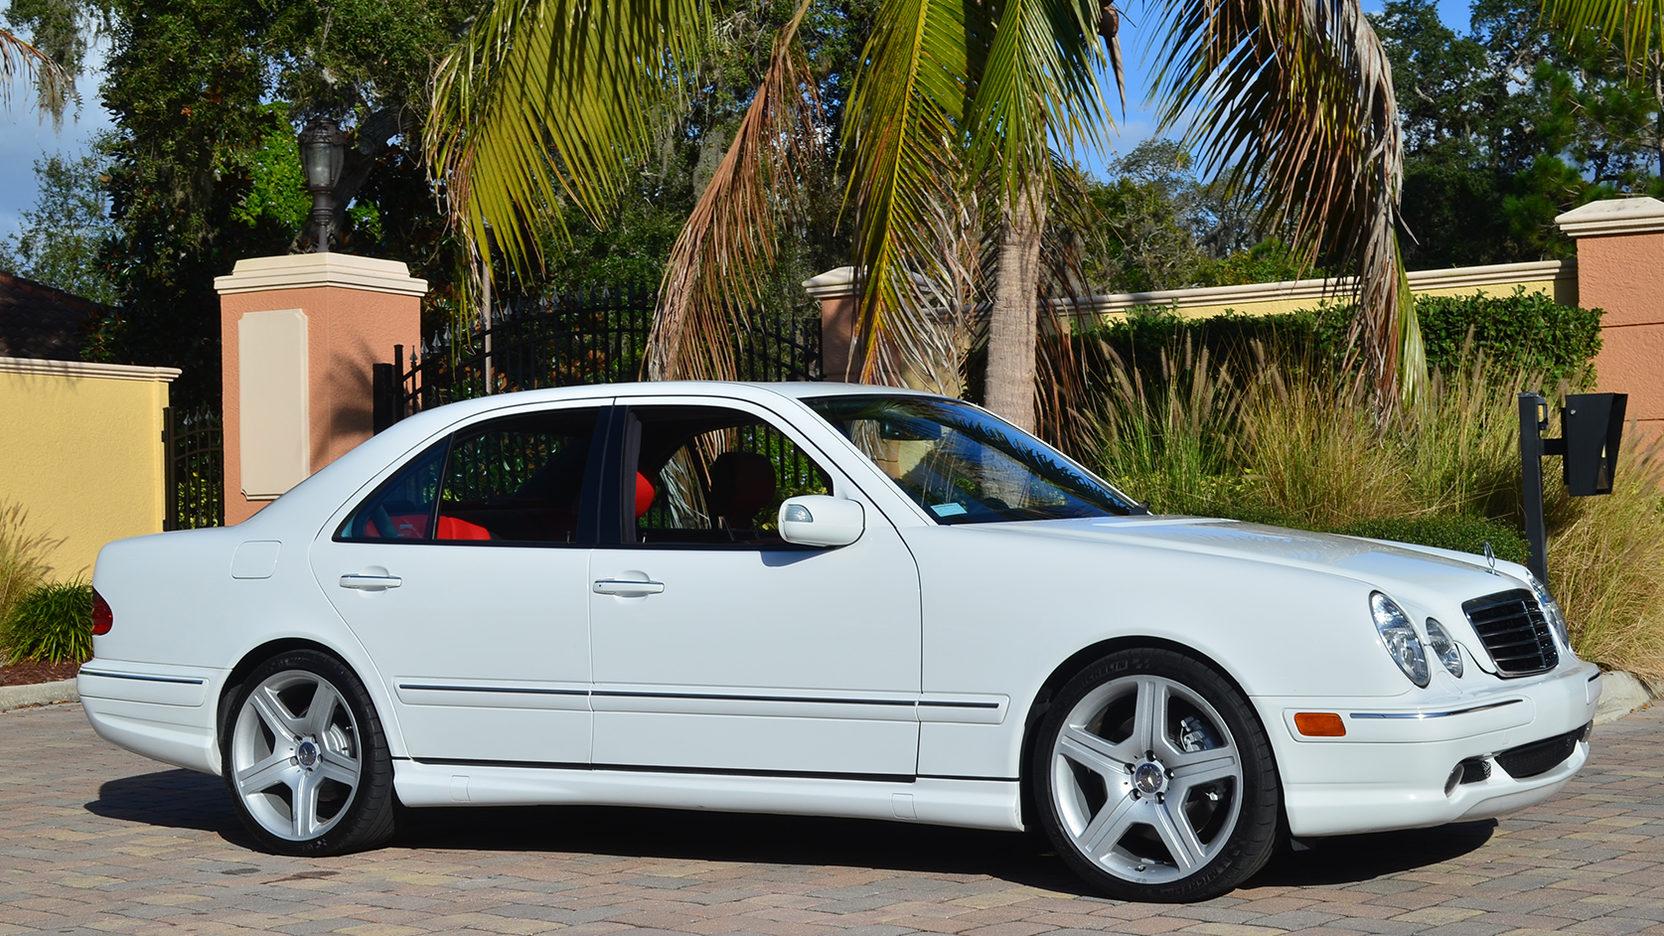 2001 Mercedes-Benz E55 (W210)